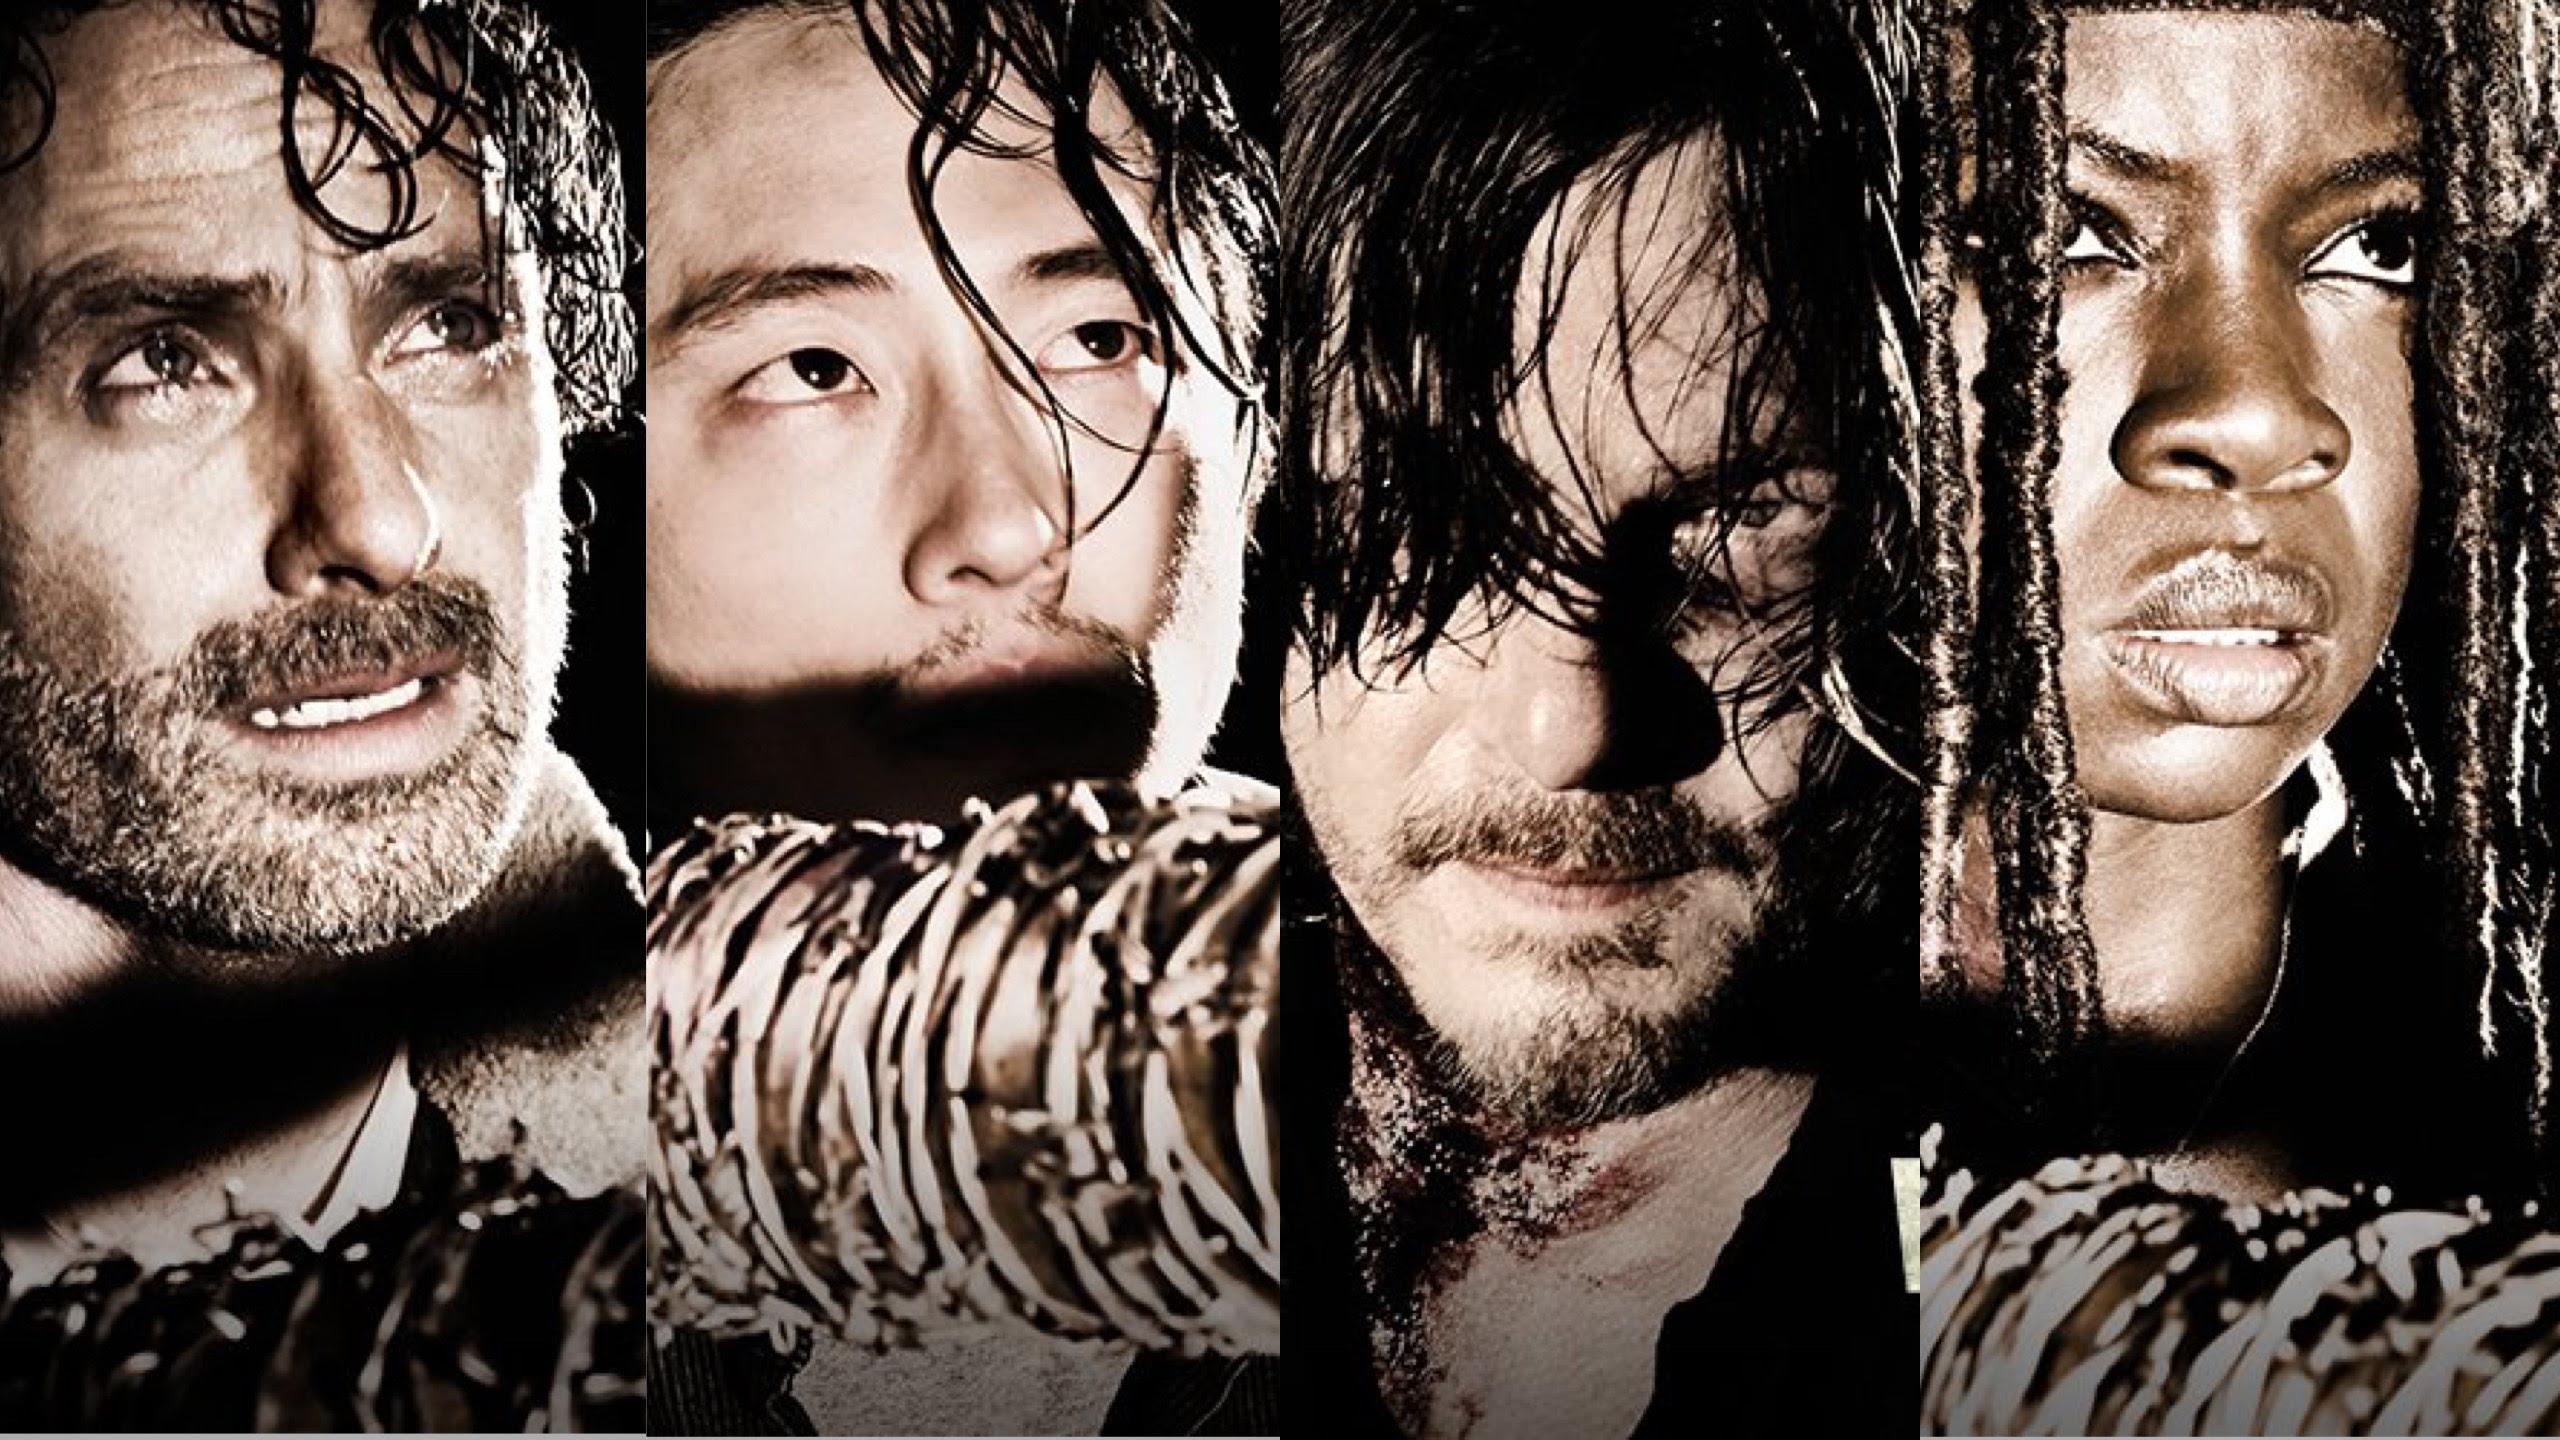 In Photos The Walking Dead Season 7 Negan S Victim Teased In